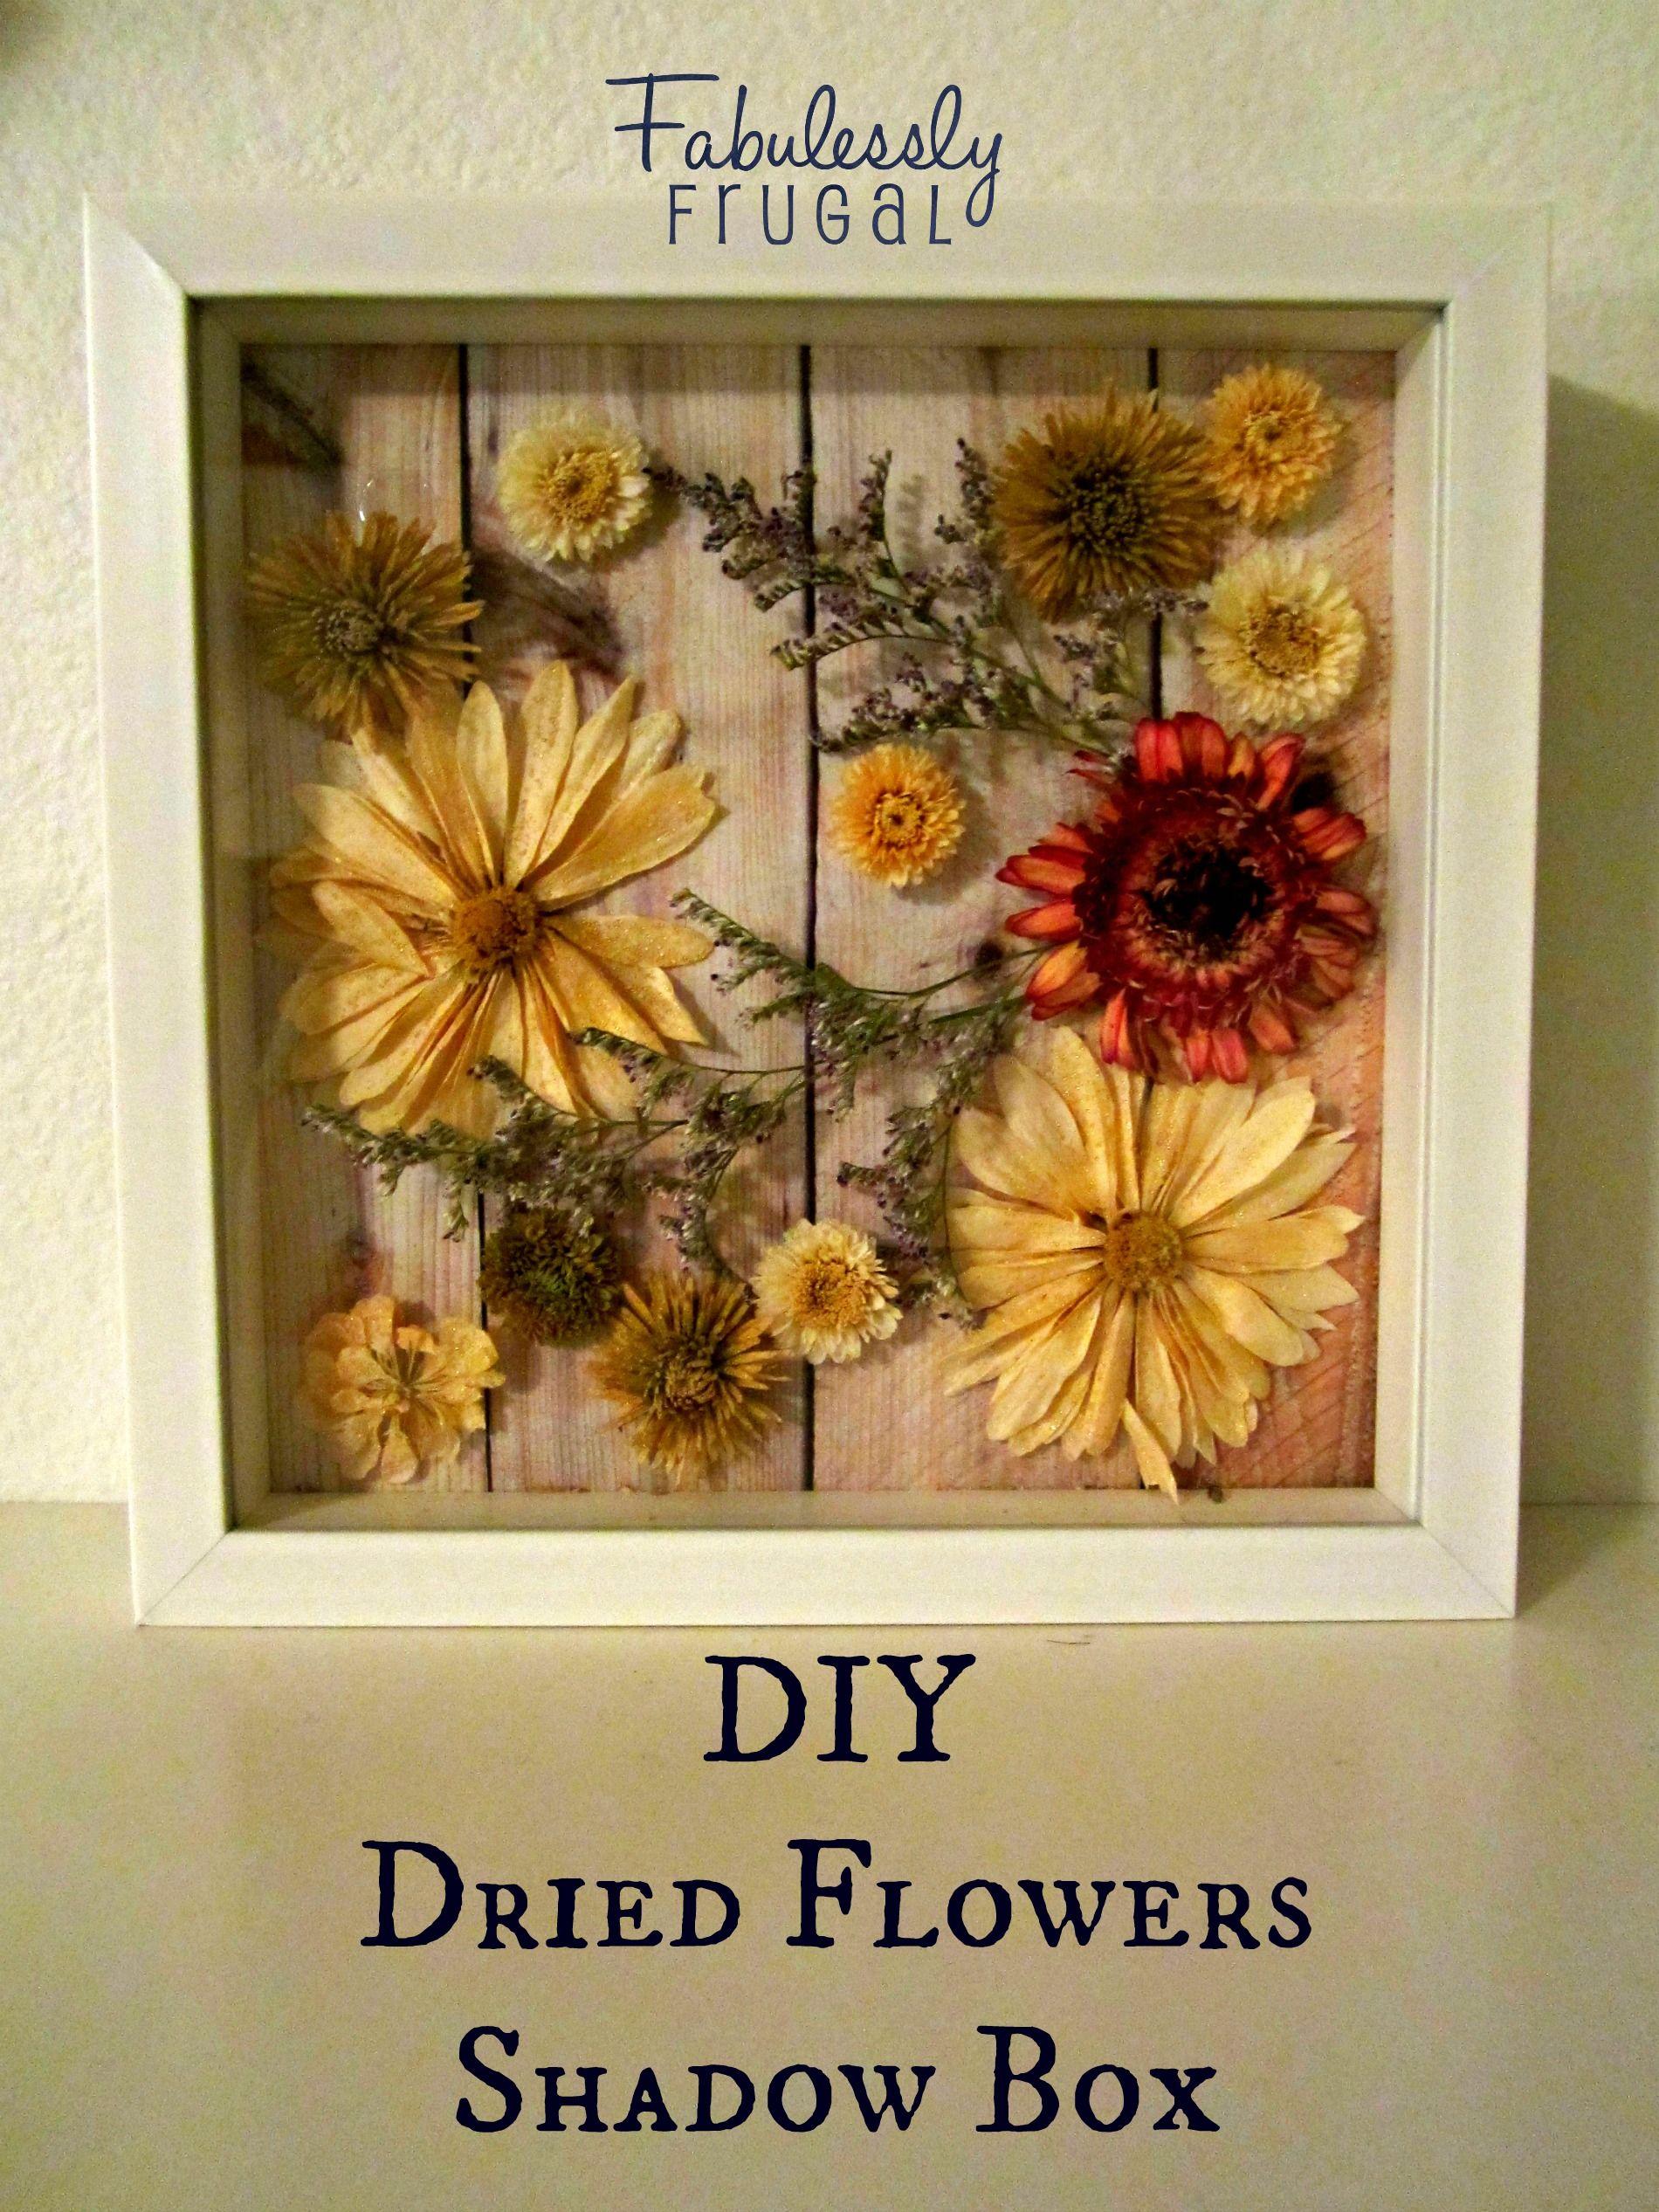 DIY Dried Flowers Shadow Box Window types, Shadow box